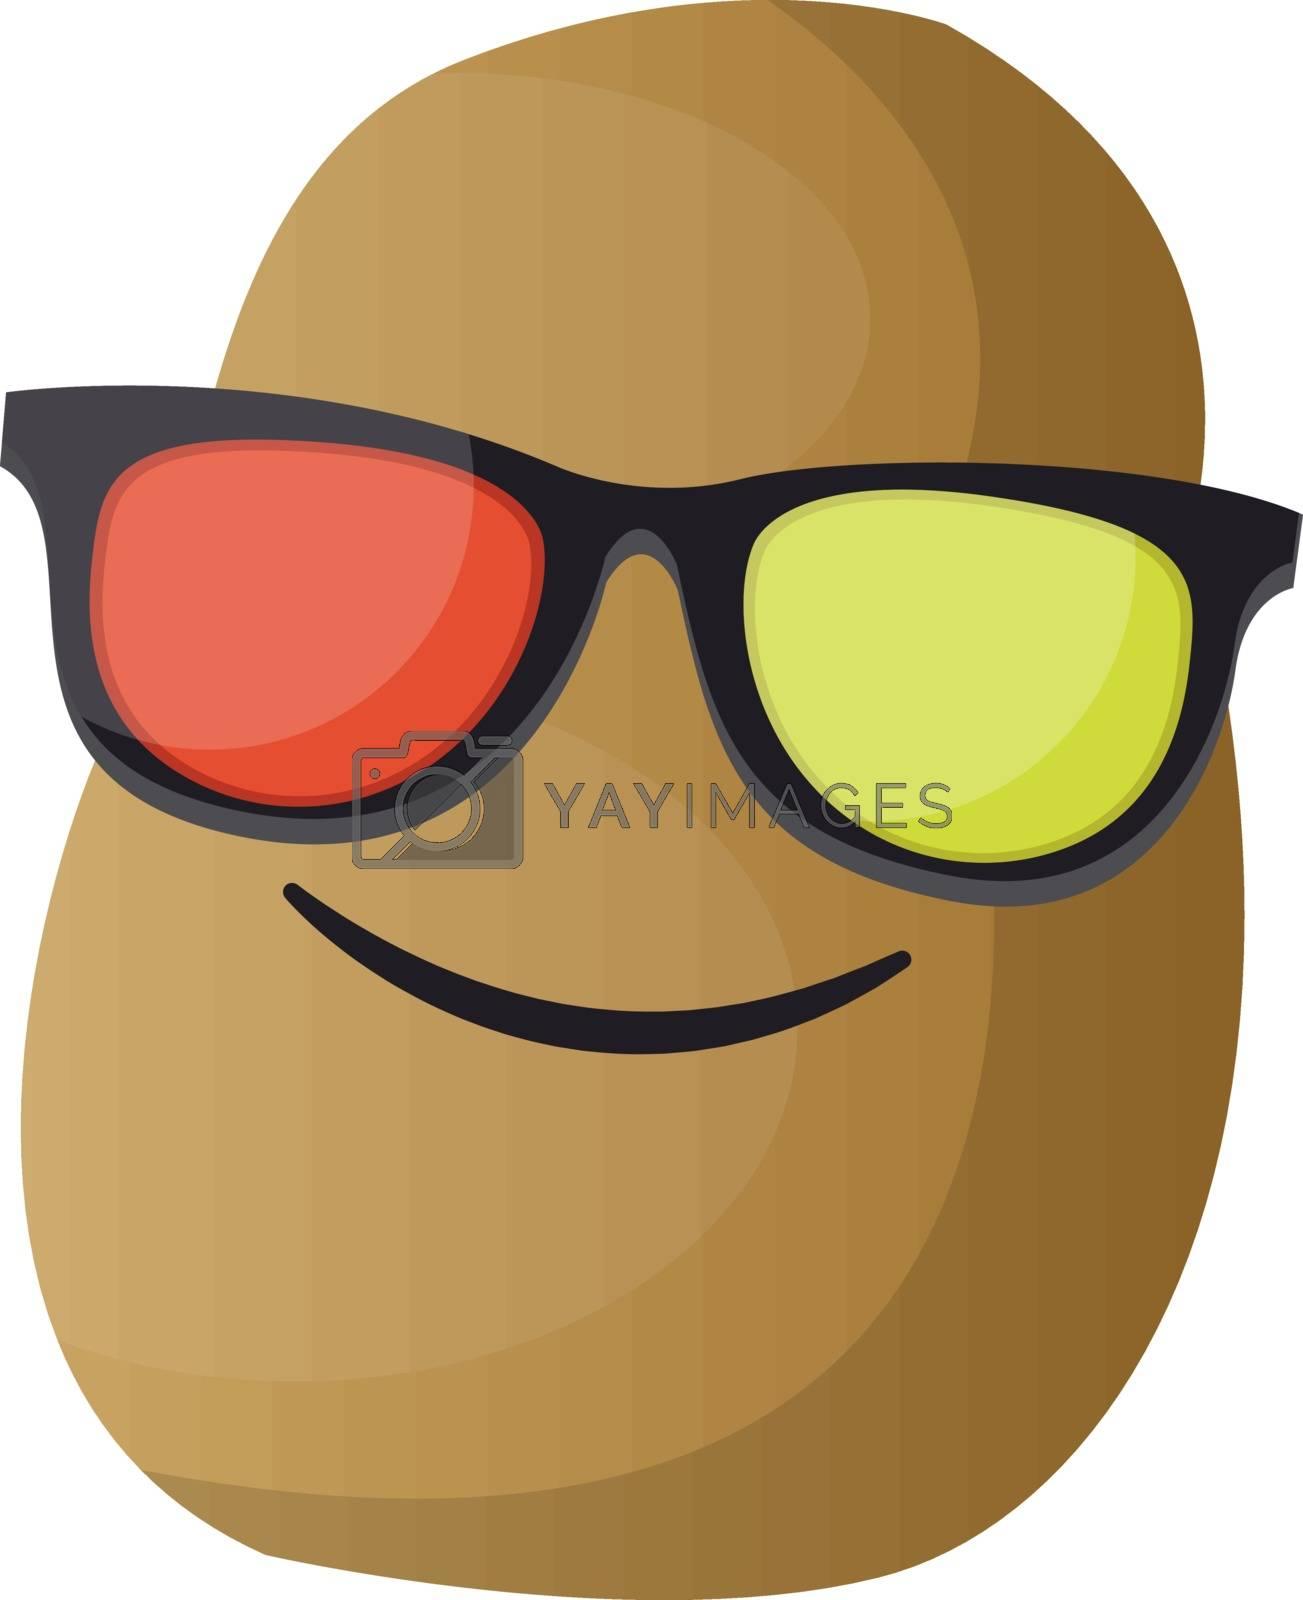 Royalty free image of Cartoon potato wearing sunglasses illustration vector on white b by Morphart